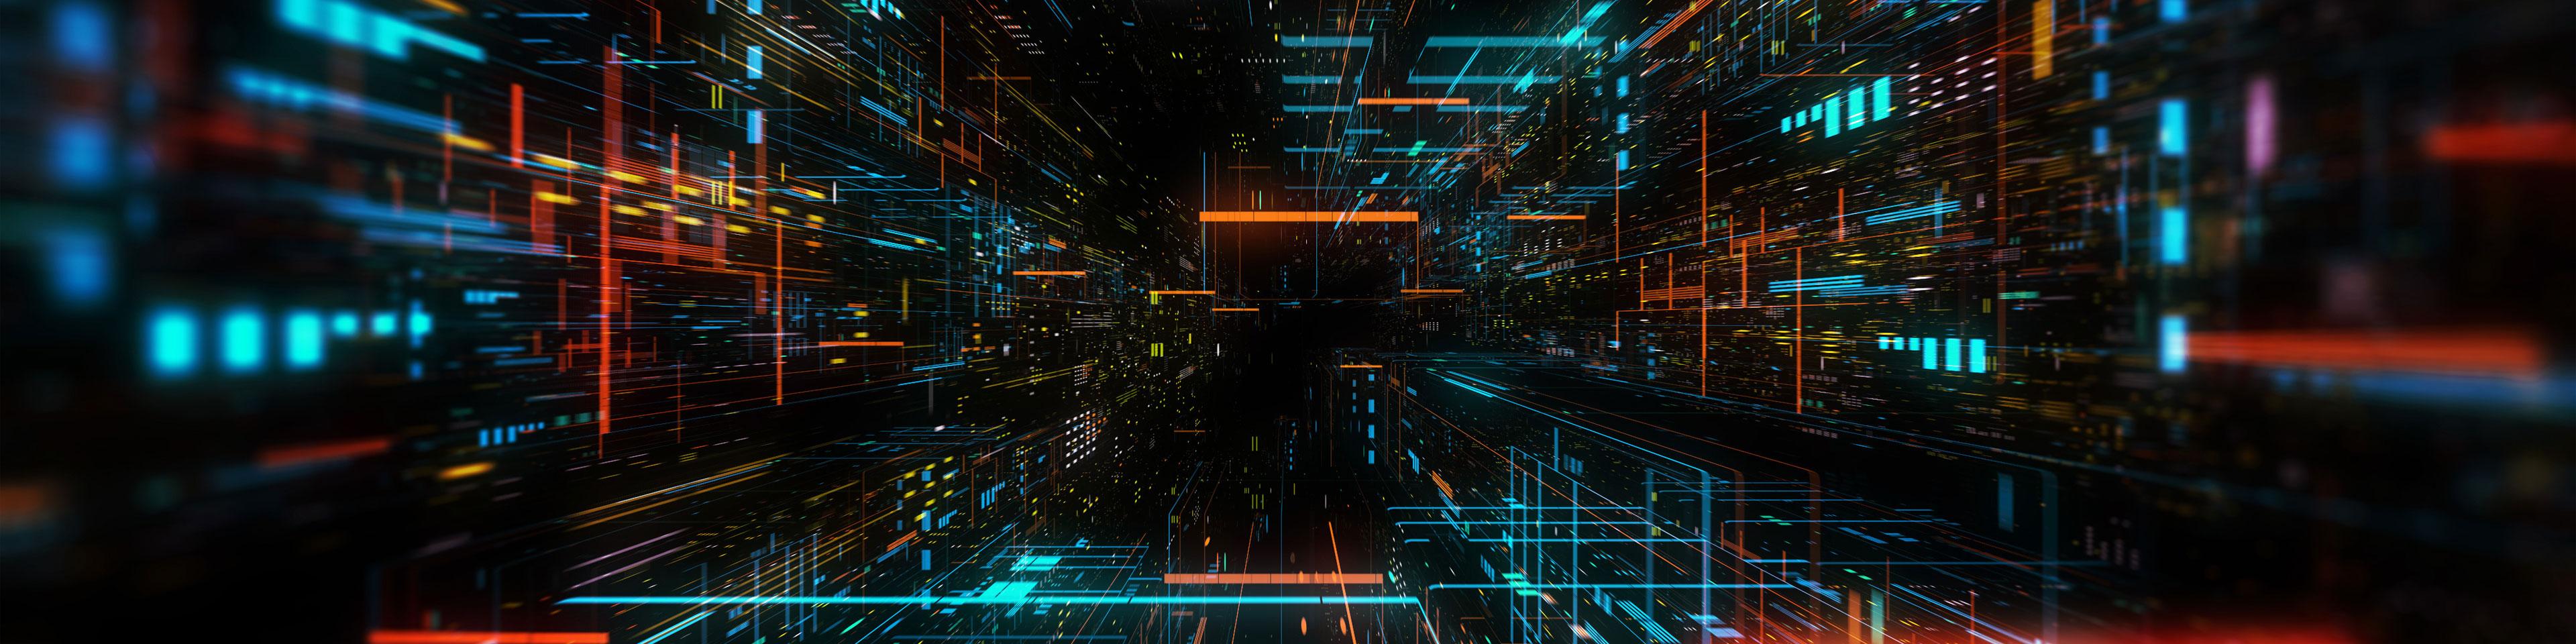 5 benefits of data analytics for internal audit